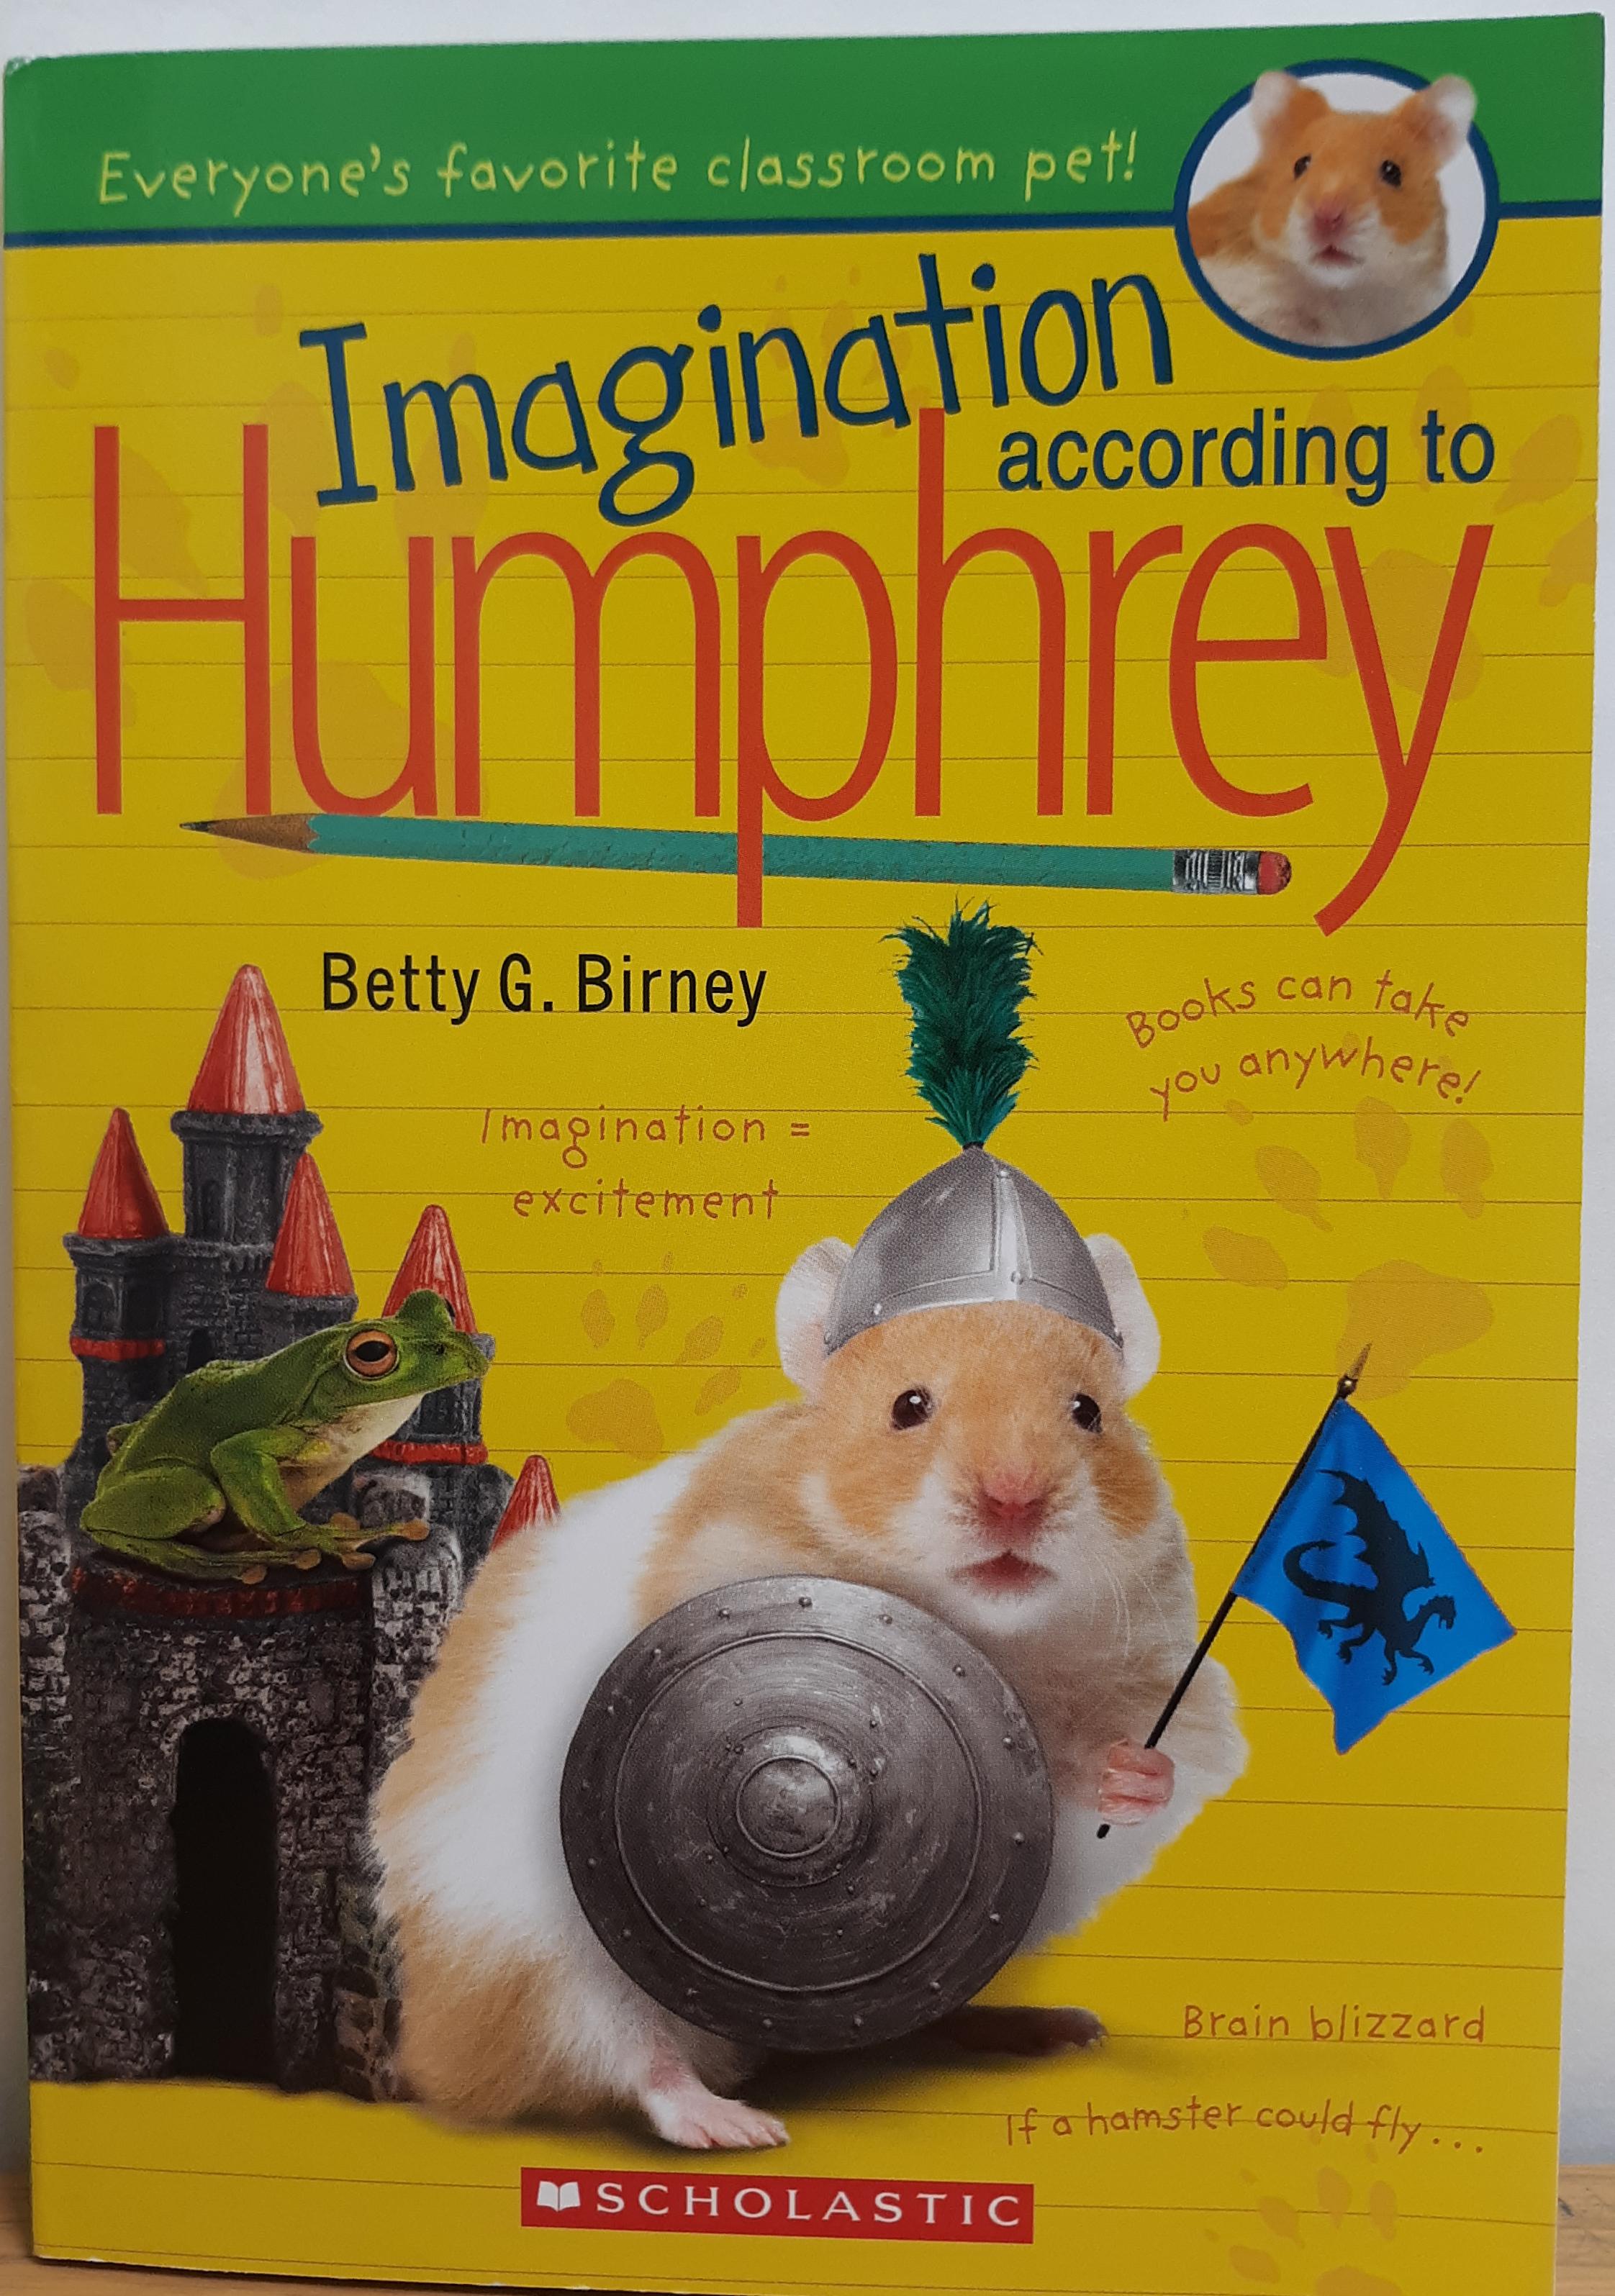 https://0201.nccdn.net/1_2/000/000/0fa/7b4/humphrey-imagination.png